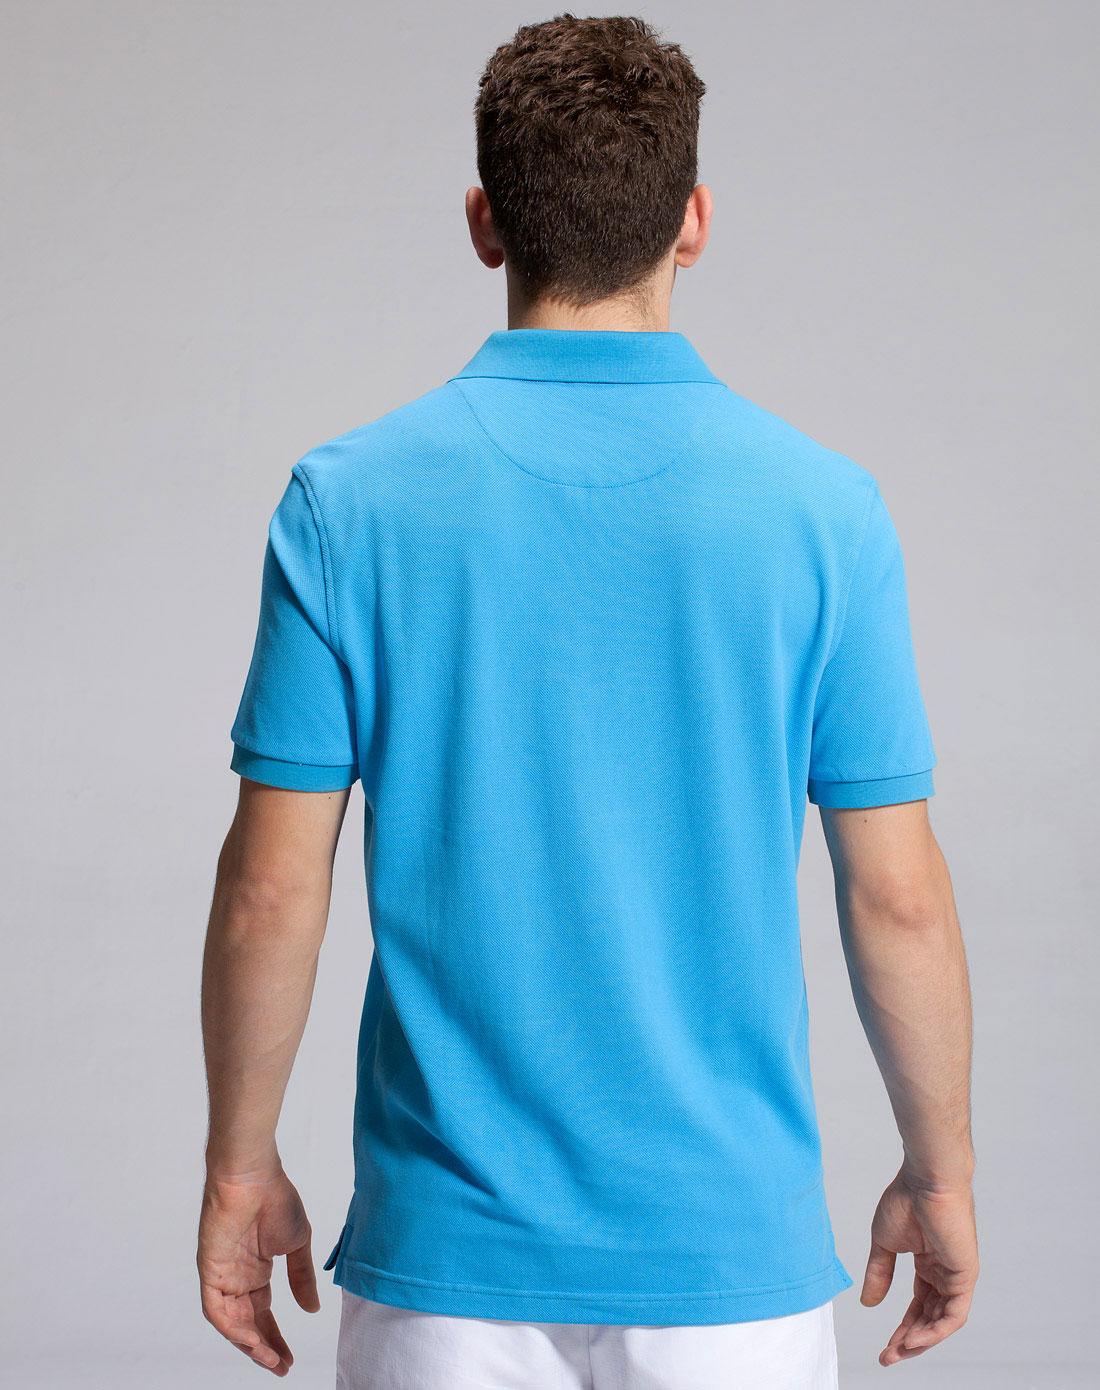 �t_粉蓝色休闲短袖t恤(专供新品)